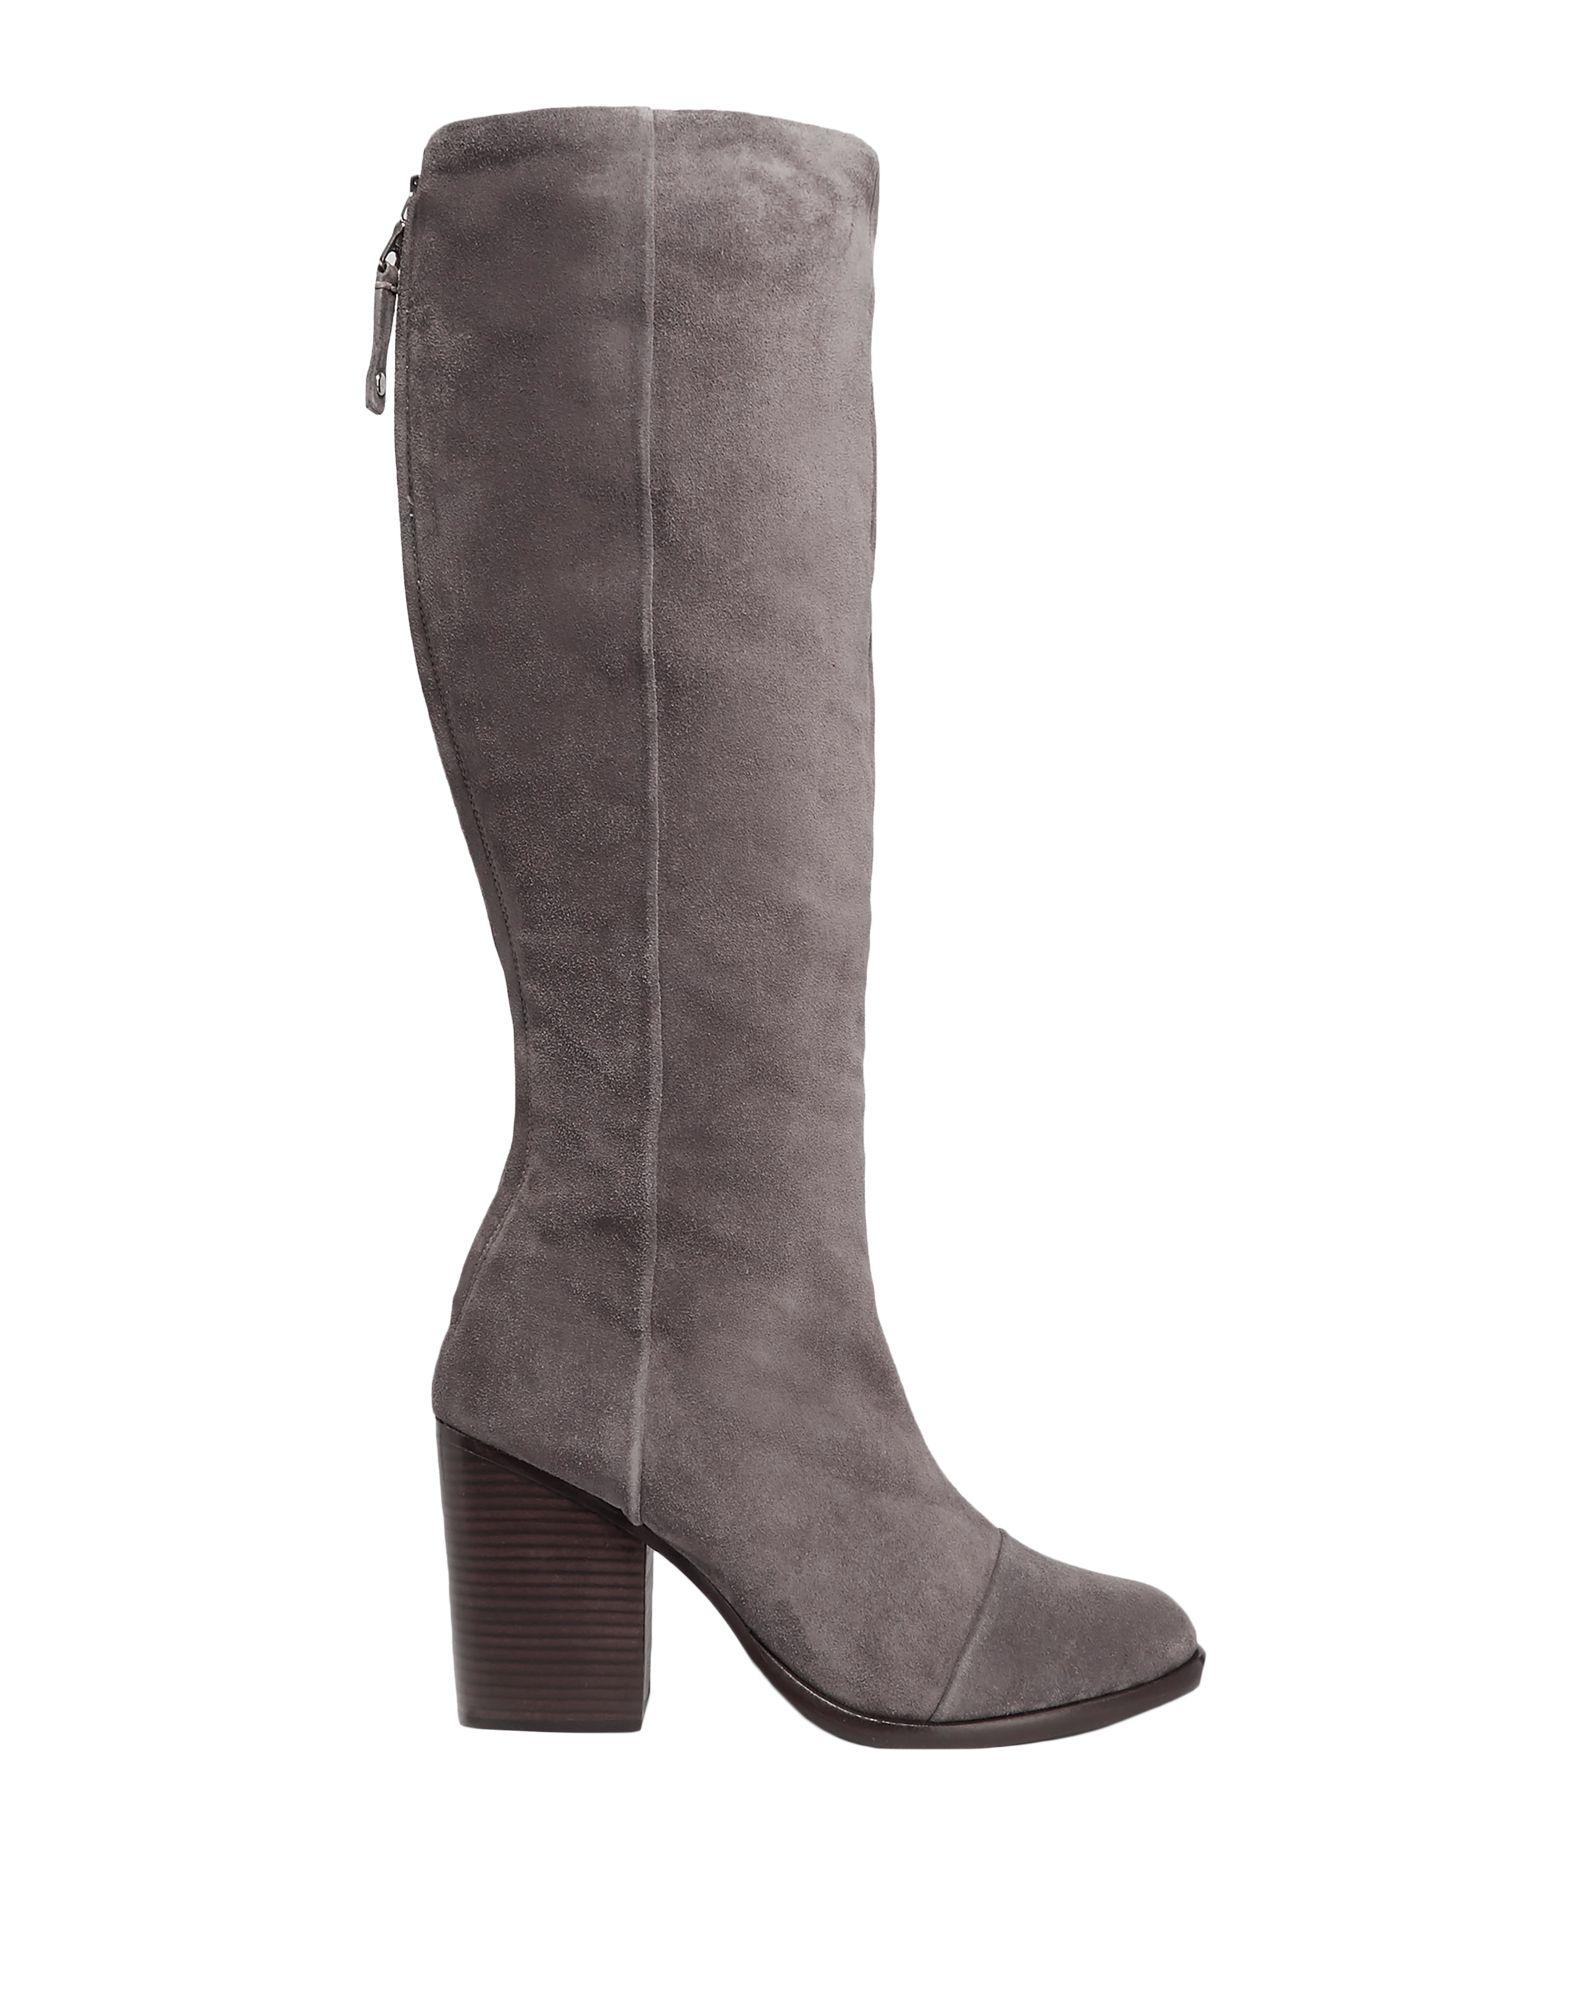 Rag & Bone Boots - Women Rag & Bone Boots - online on  Australia - Boots 11553599JW e4e342